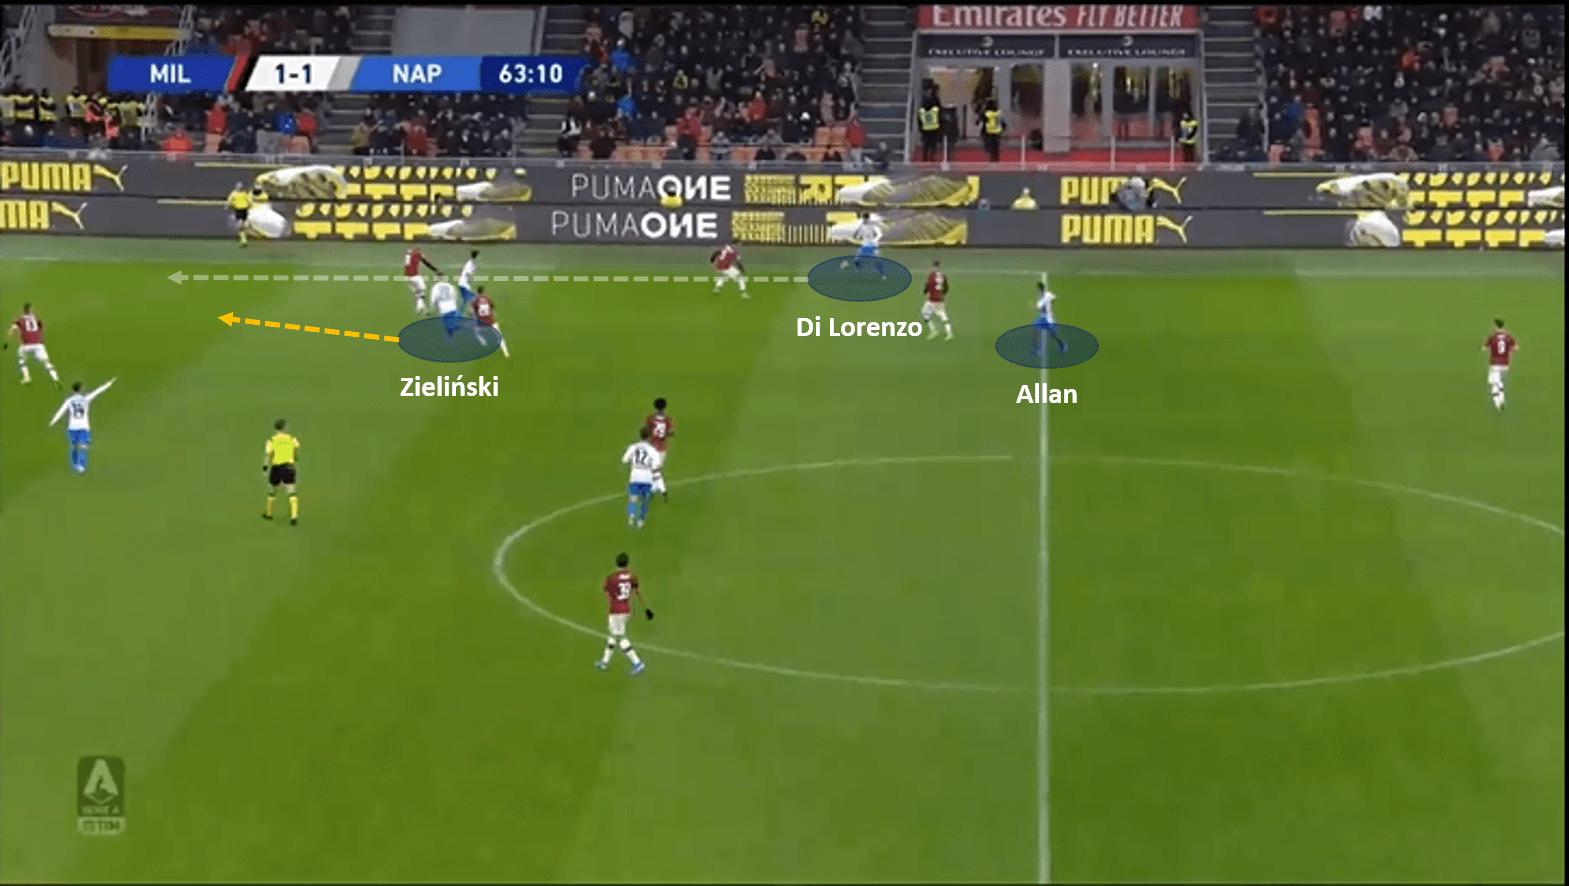 Piotr Zieliński 2019/20 - scout report - tactical analysis tactics